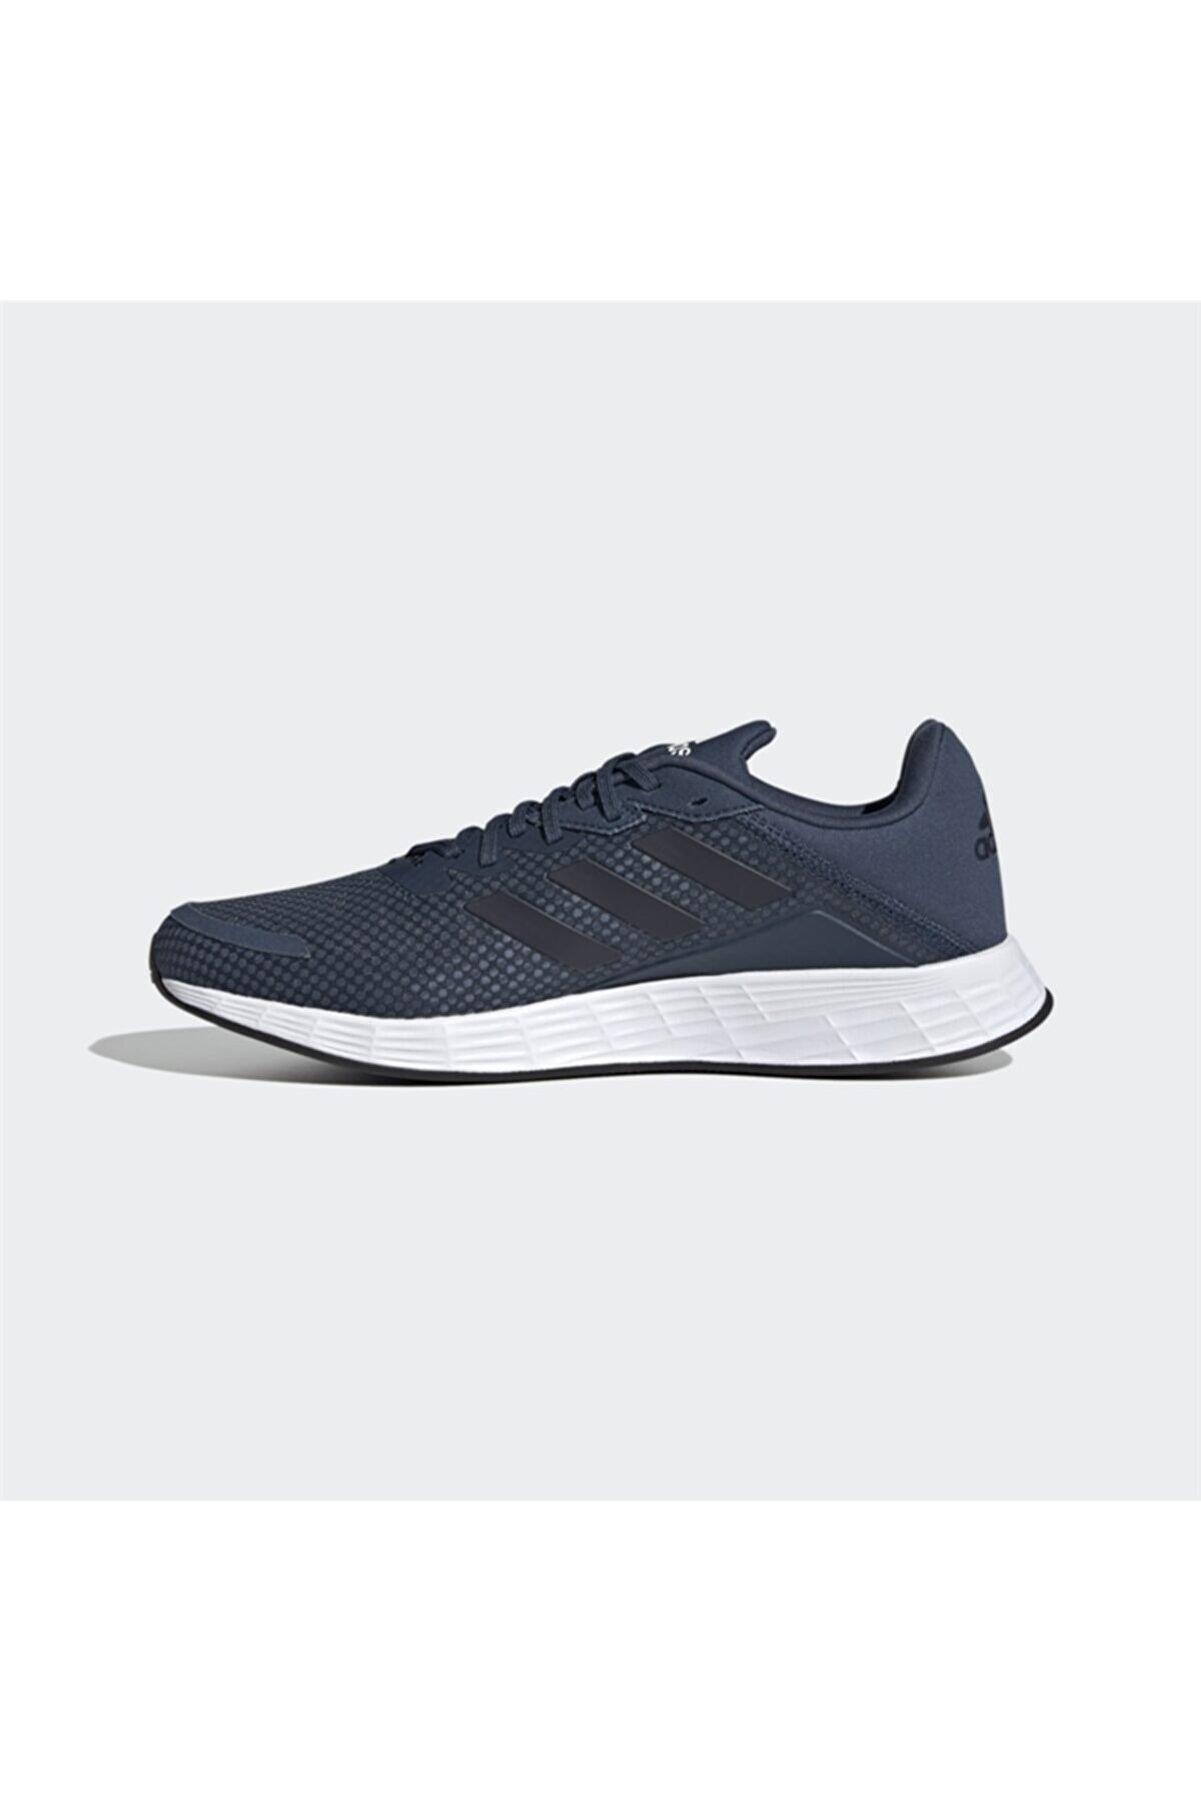 adidas Duramo Sl Crenav/legınk/ftwwht